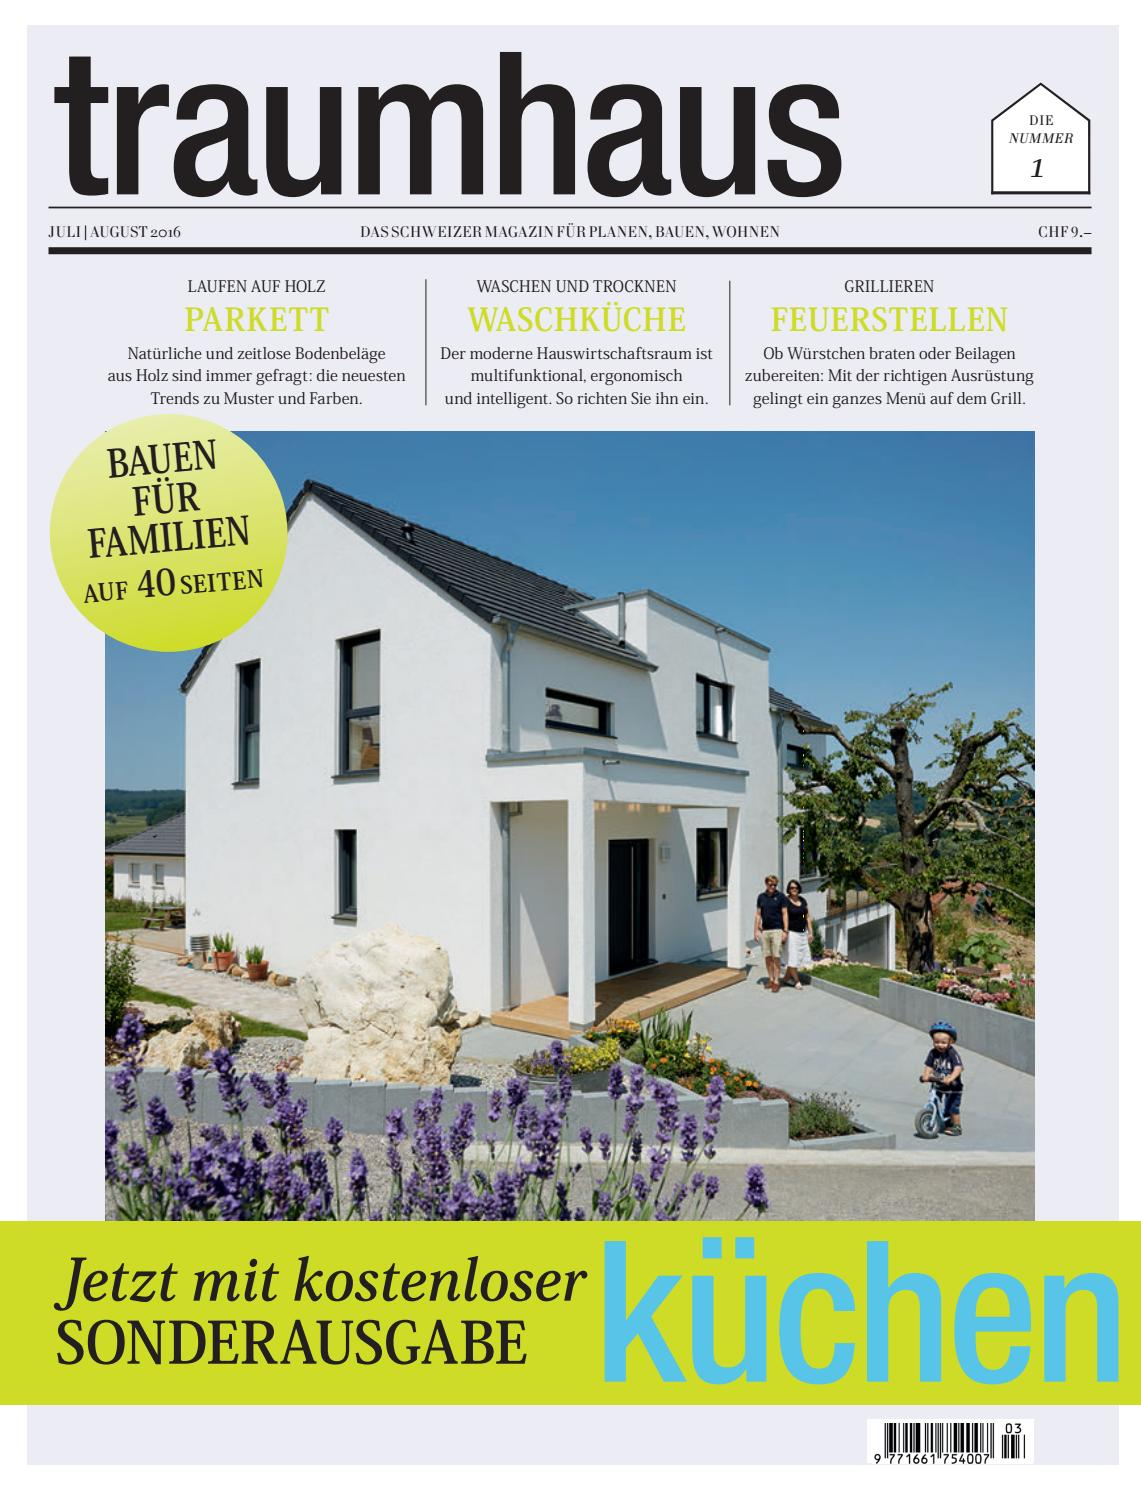 Heft im Heft: Fertigbau 2016 by Family Home Verlag GmbH - issuu